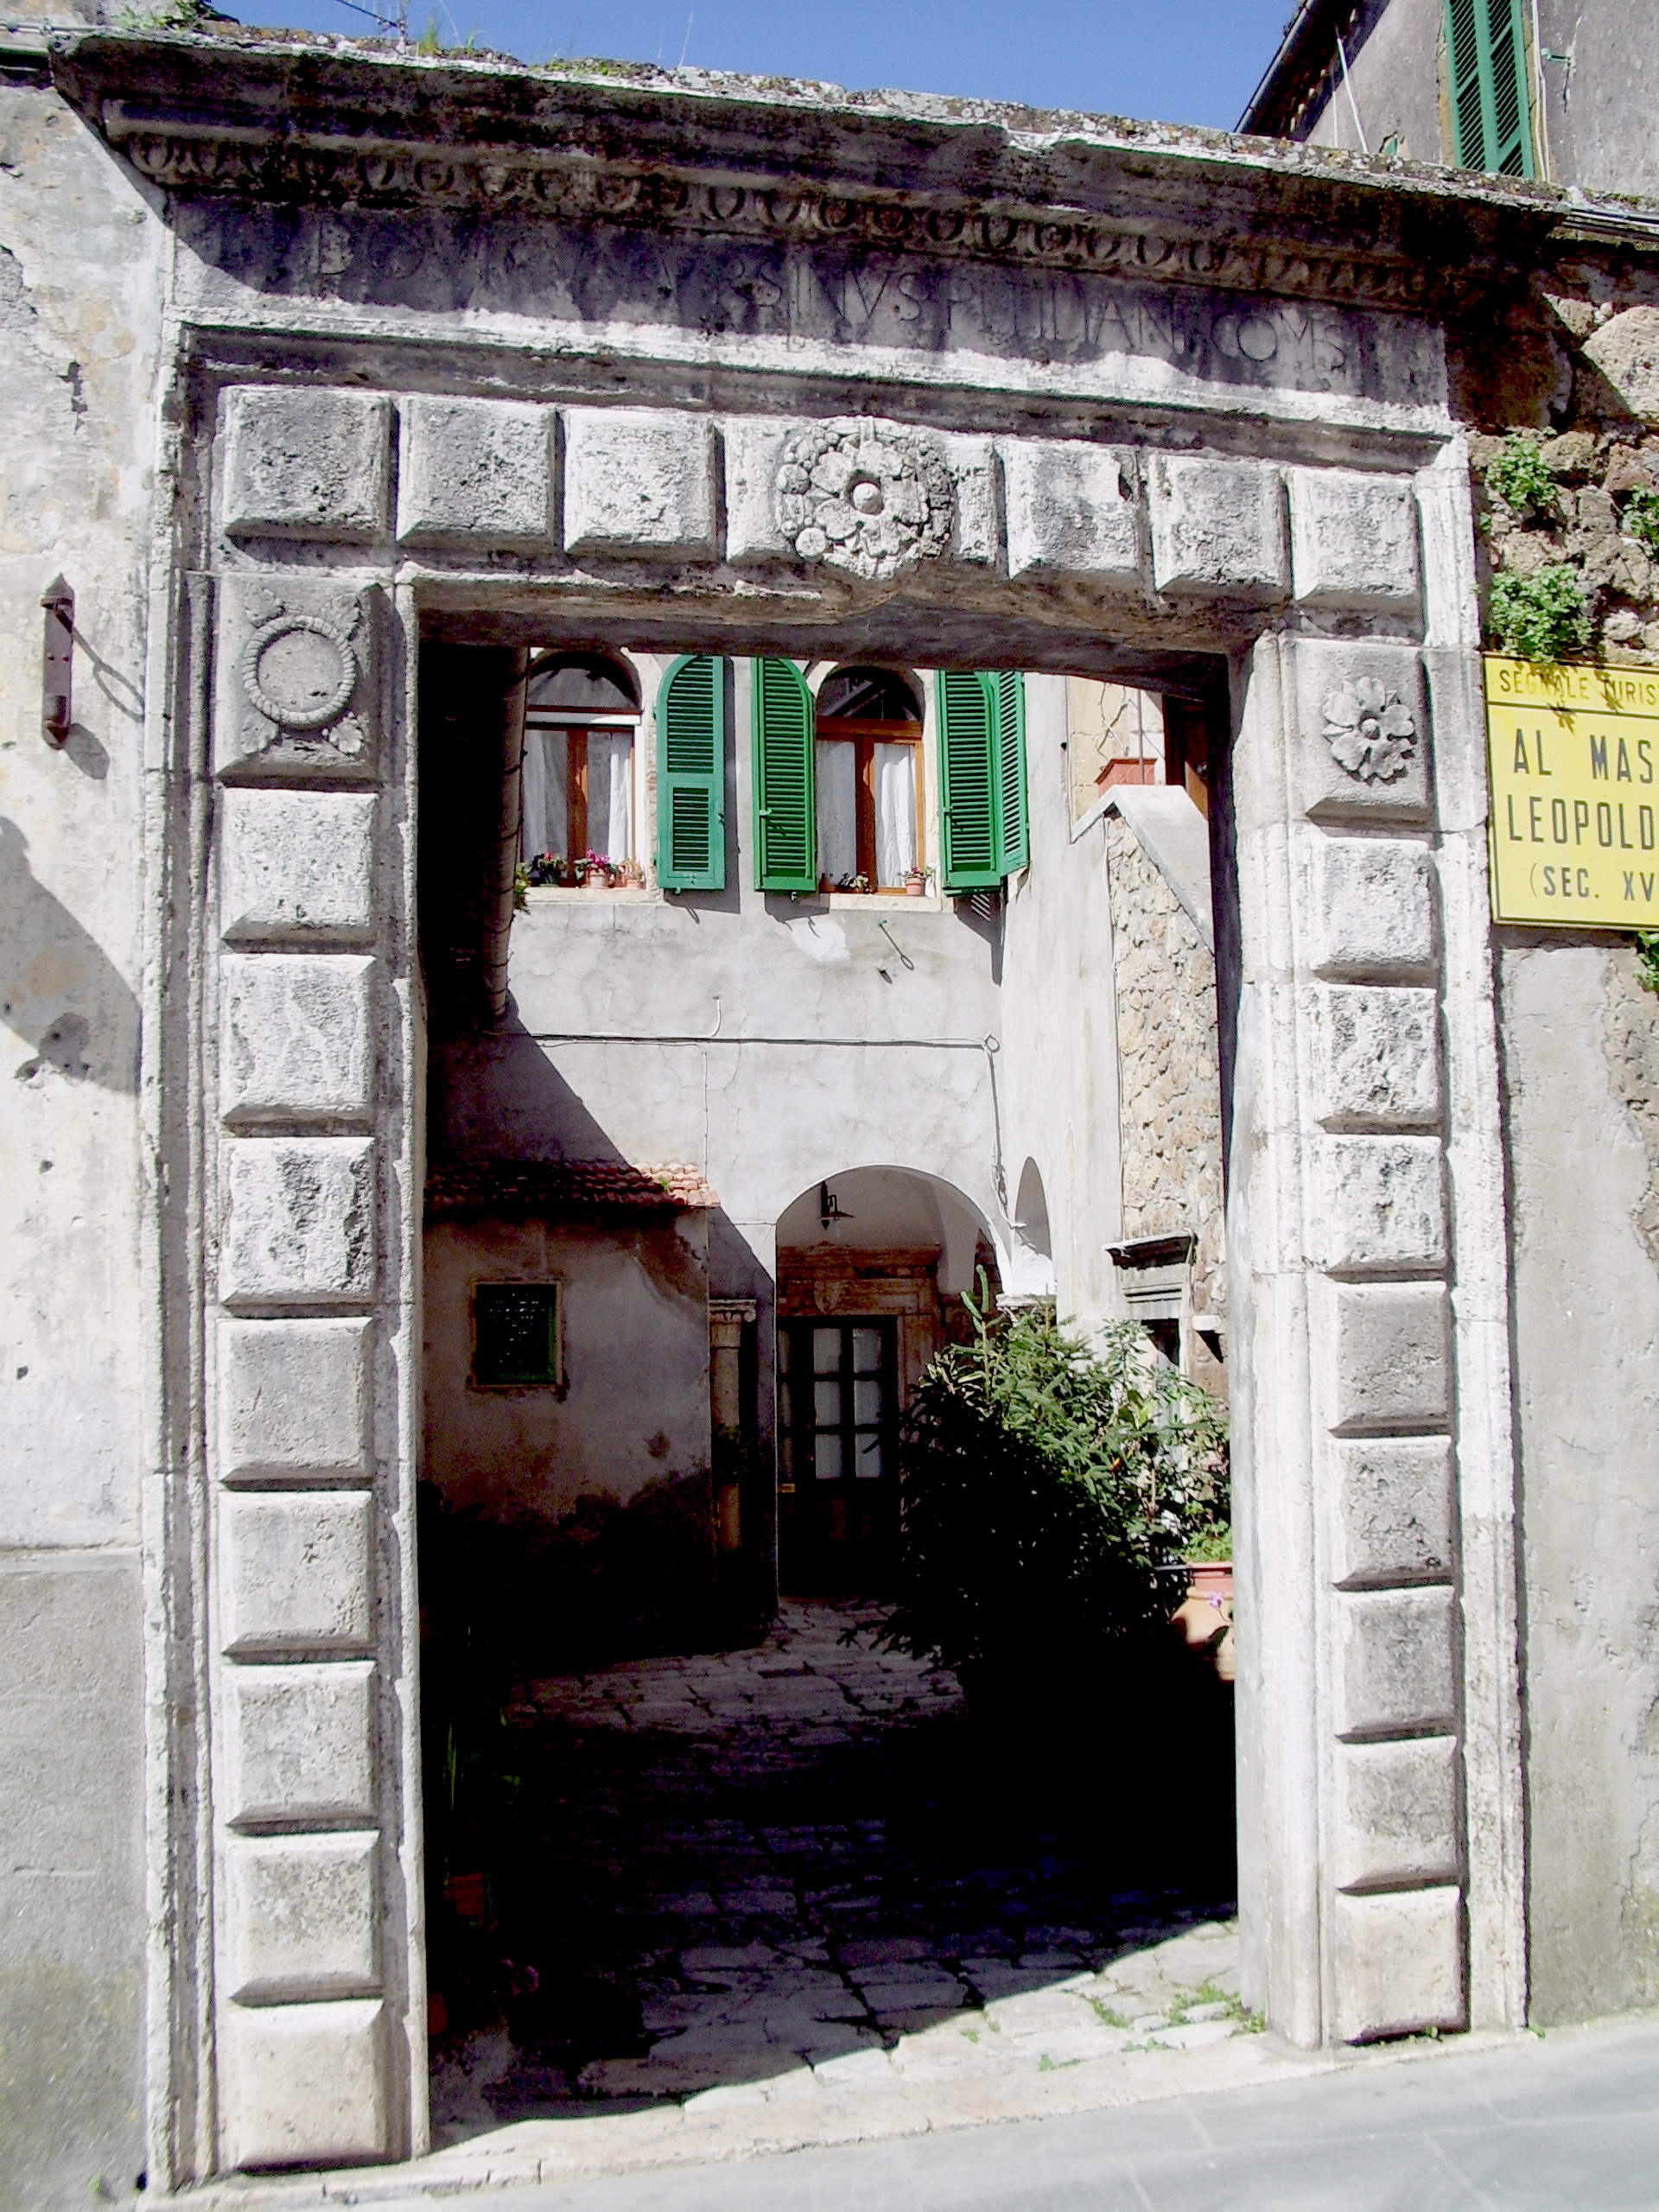 Porta Esterna Palazzo Comitale Sorano.jpg